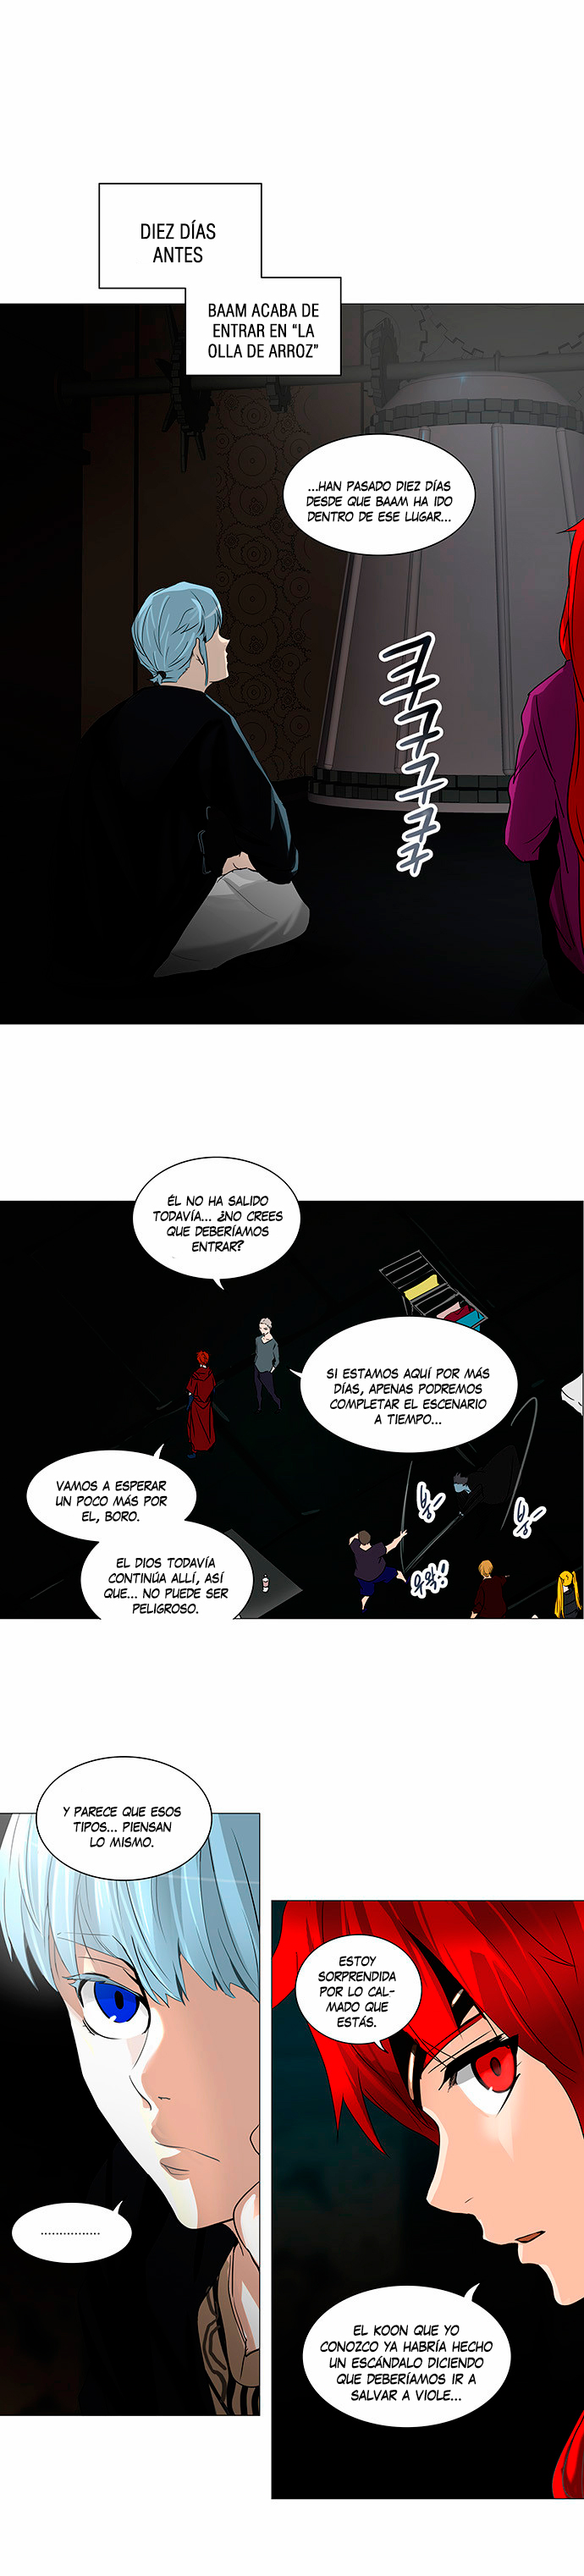 http://c5.ninemanga.com/es_manga/21/149/418481/48af87b587036693d6a3caf03db7dc02.jpg Page 6